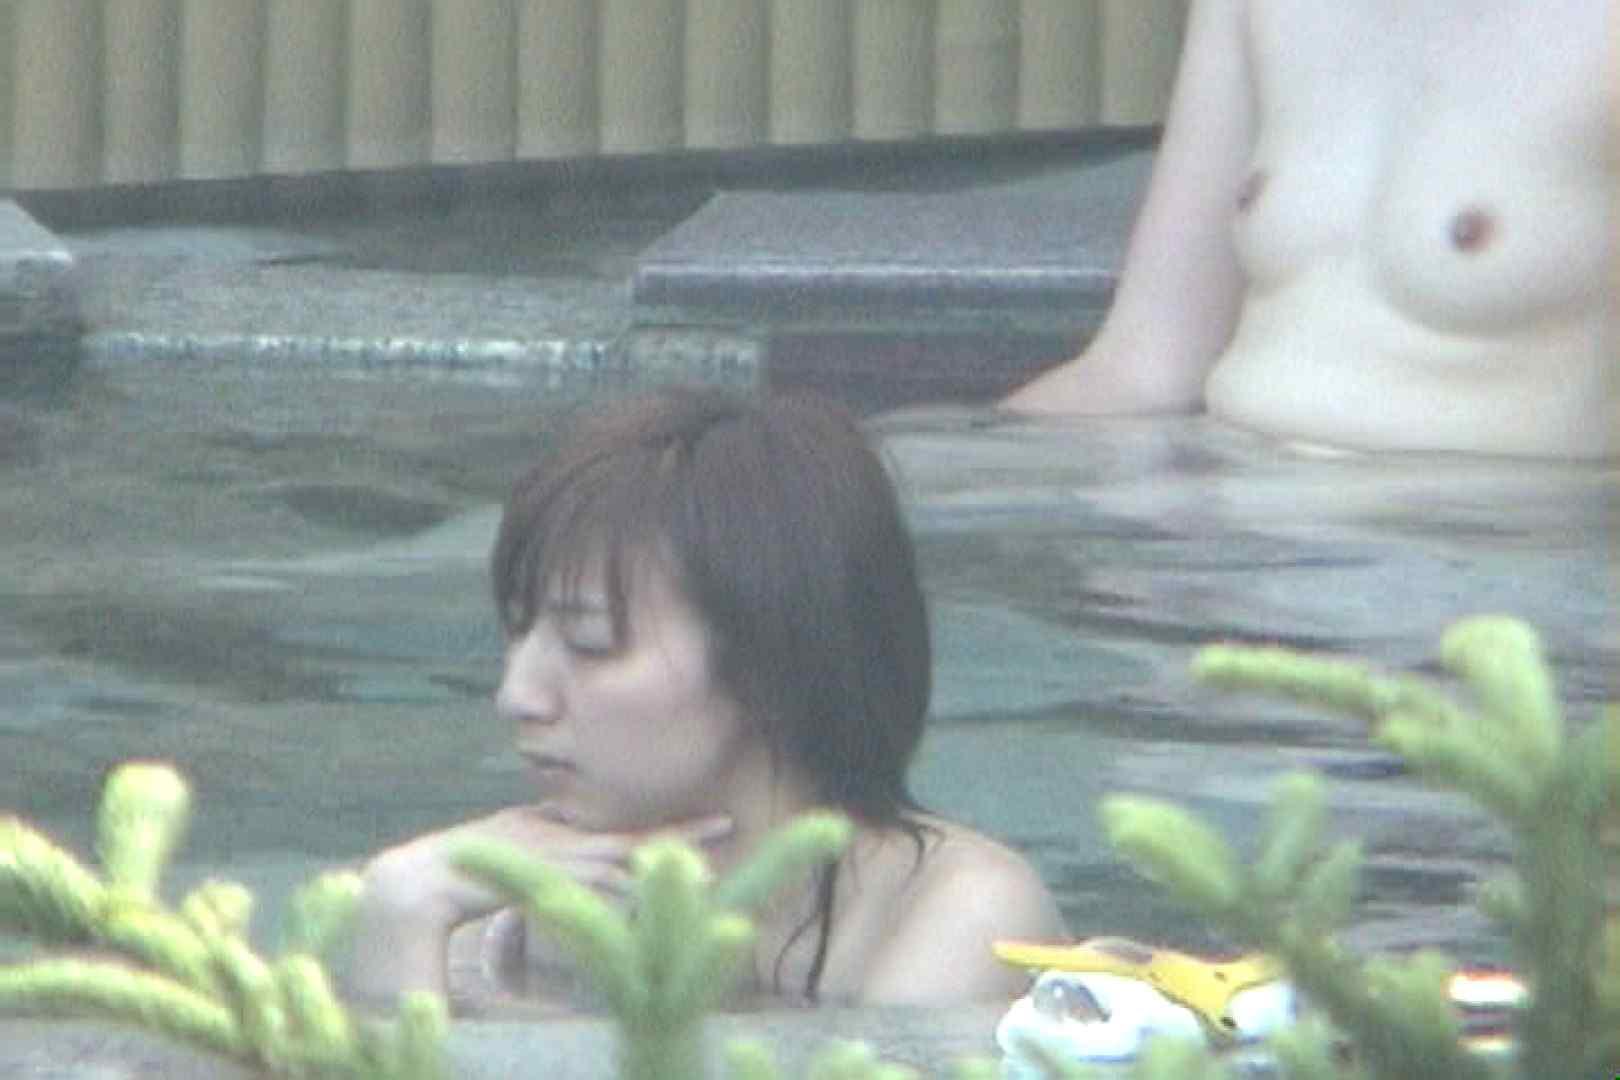 Aquaな露天風呂Vol.77【VIP限定】 露天風呂編 | 盗撮シリーズ  100PIX 17